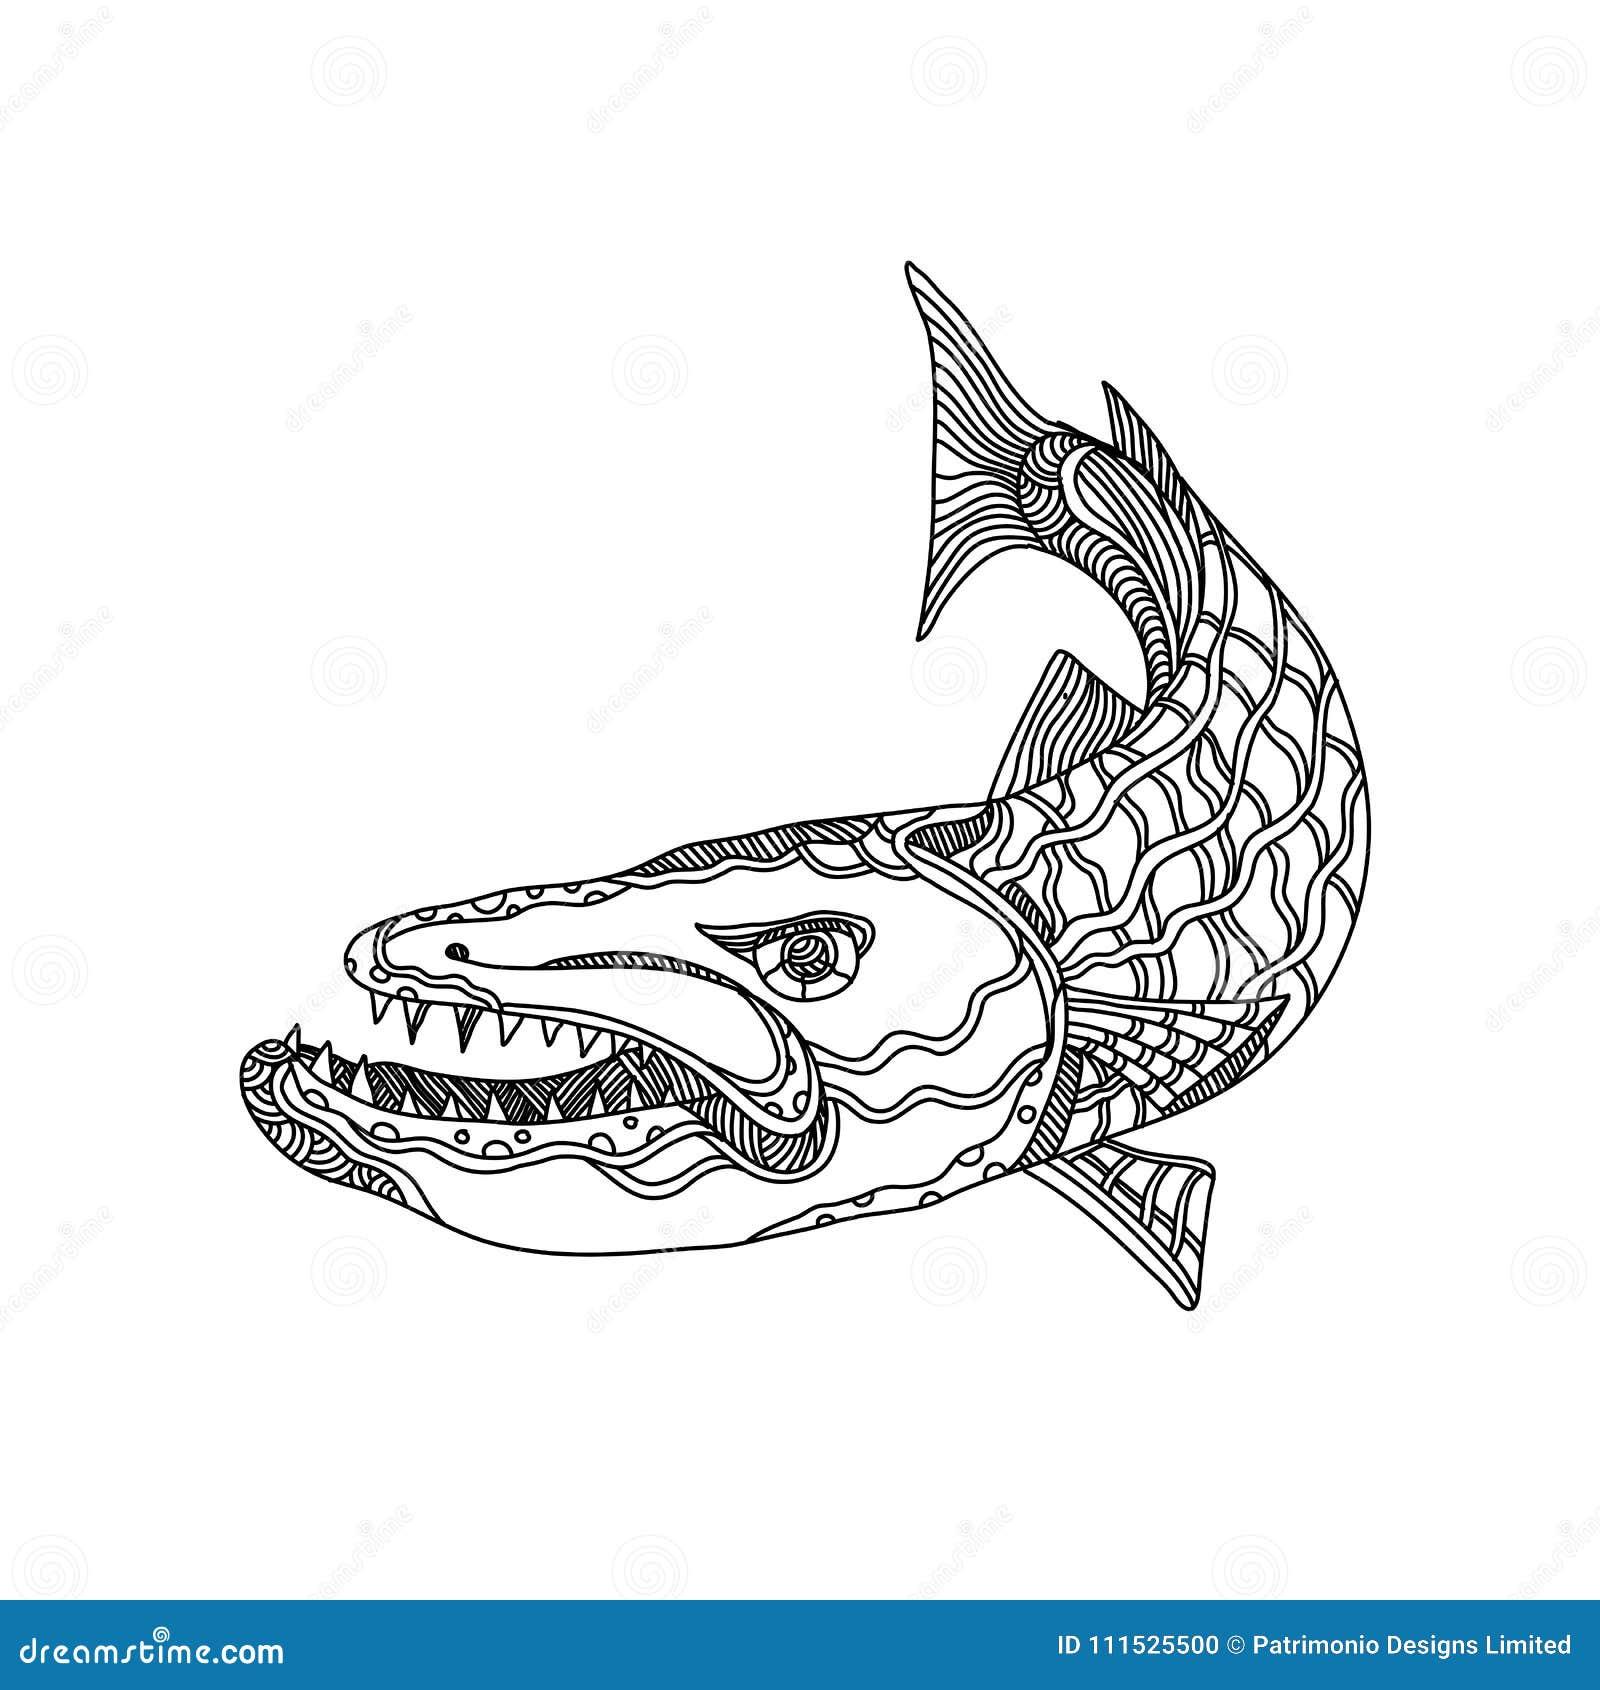 Barracuda Fish Doodle Art stock illustration  Illustration of